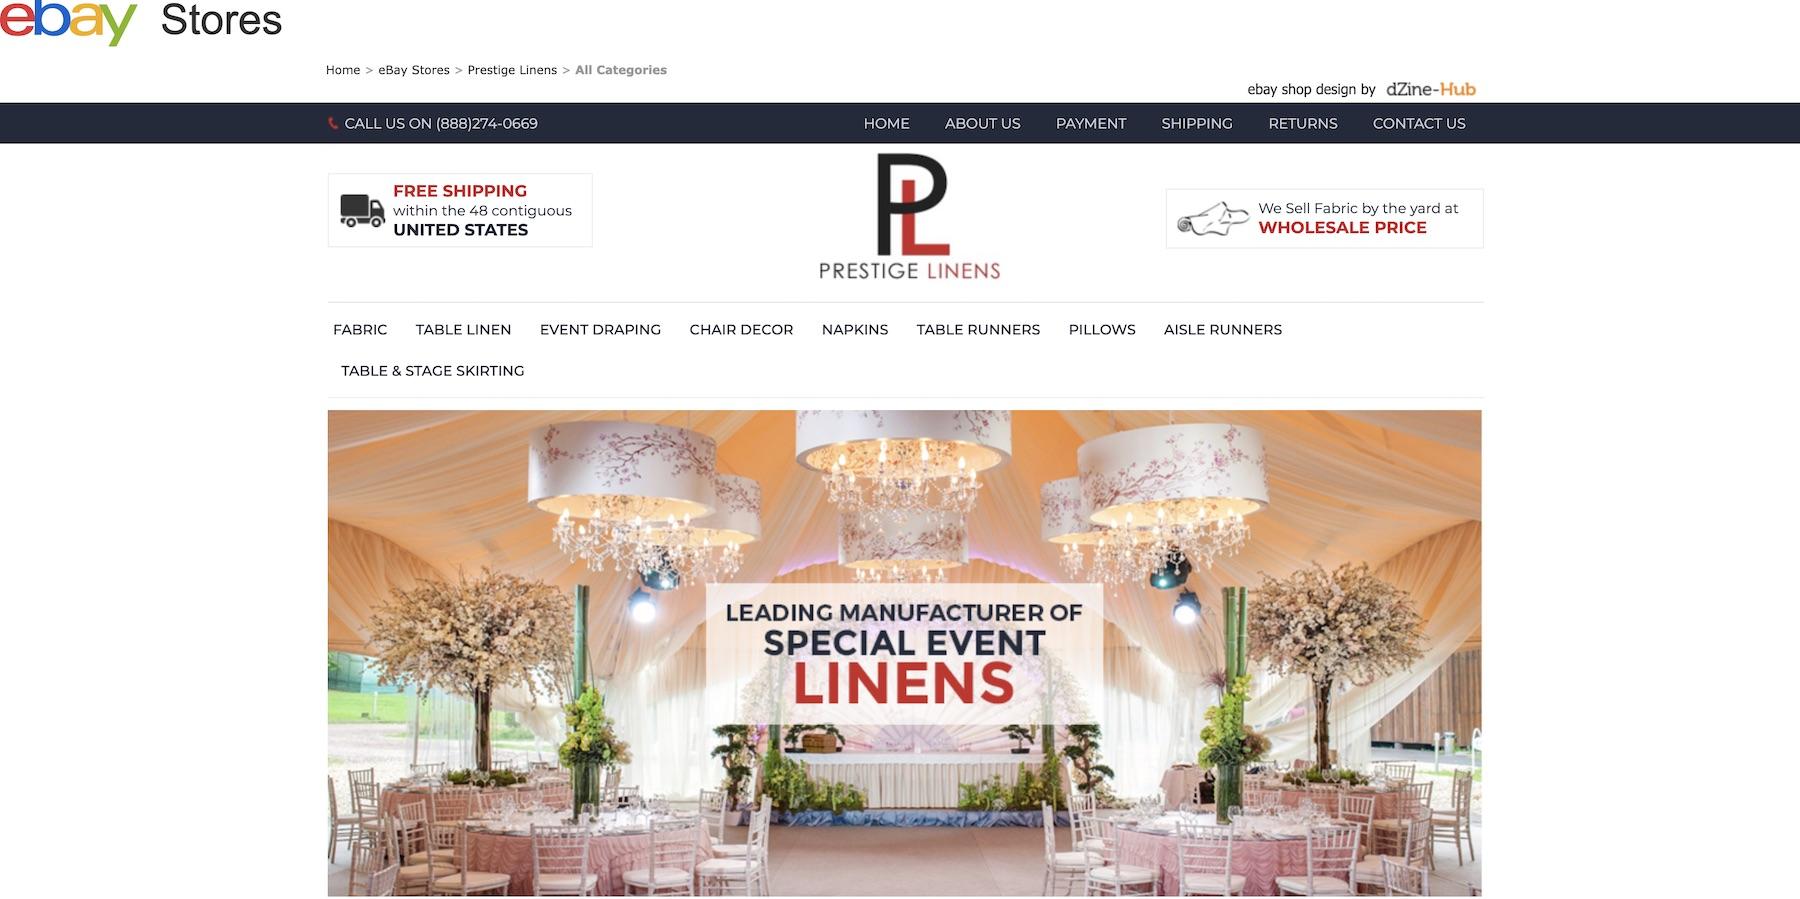 prestige-linen-ebay-store-home